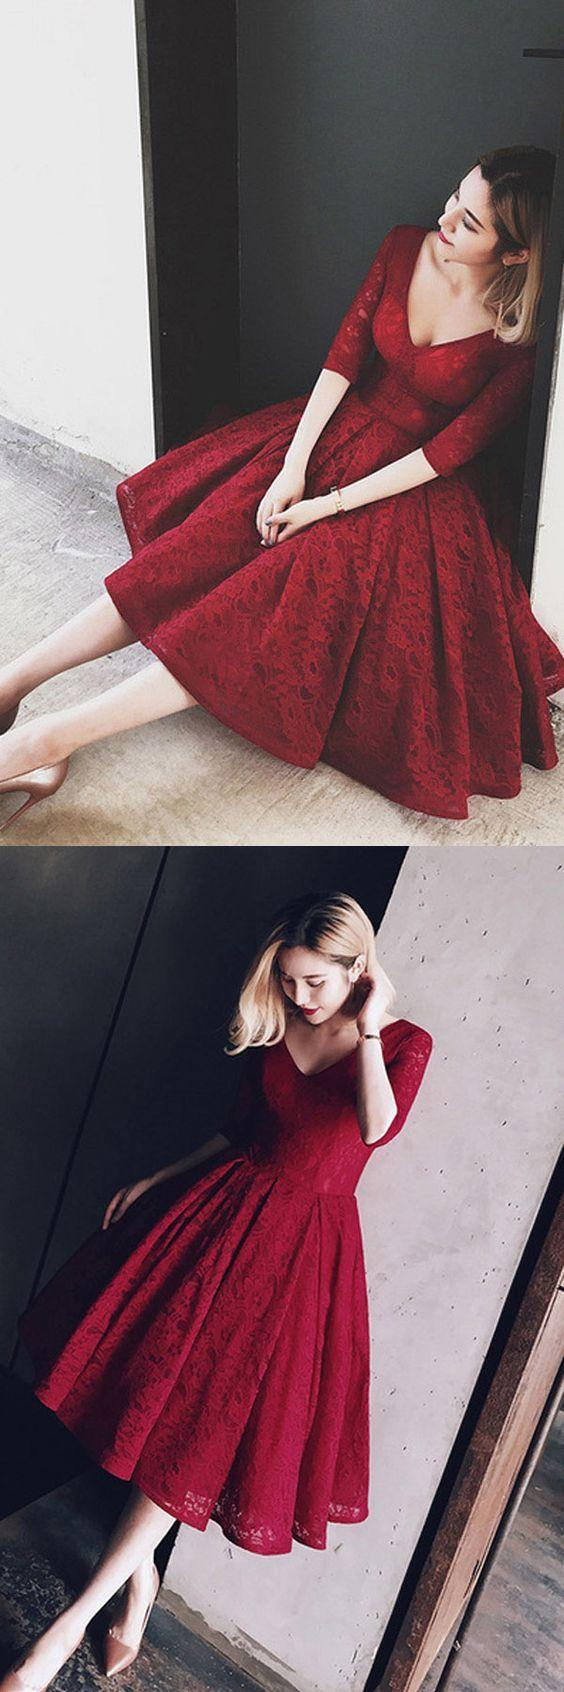 Свадьба - V Neck Half Sleeves Burgundy Lace Homecoming Dress Short Prom Dress PG104